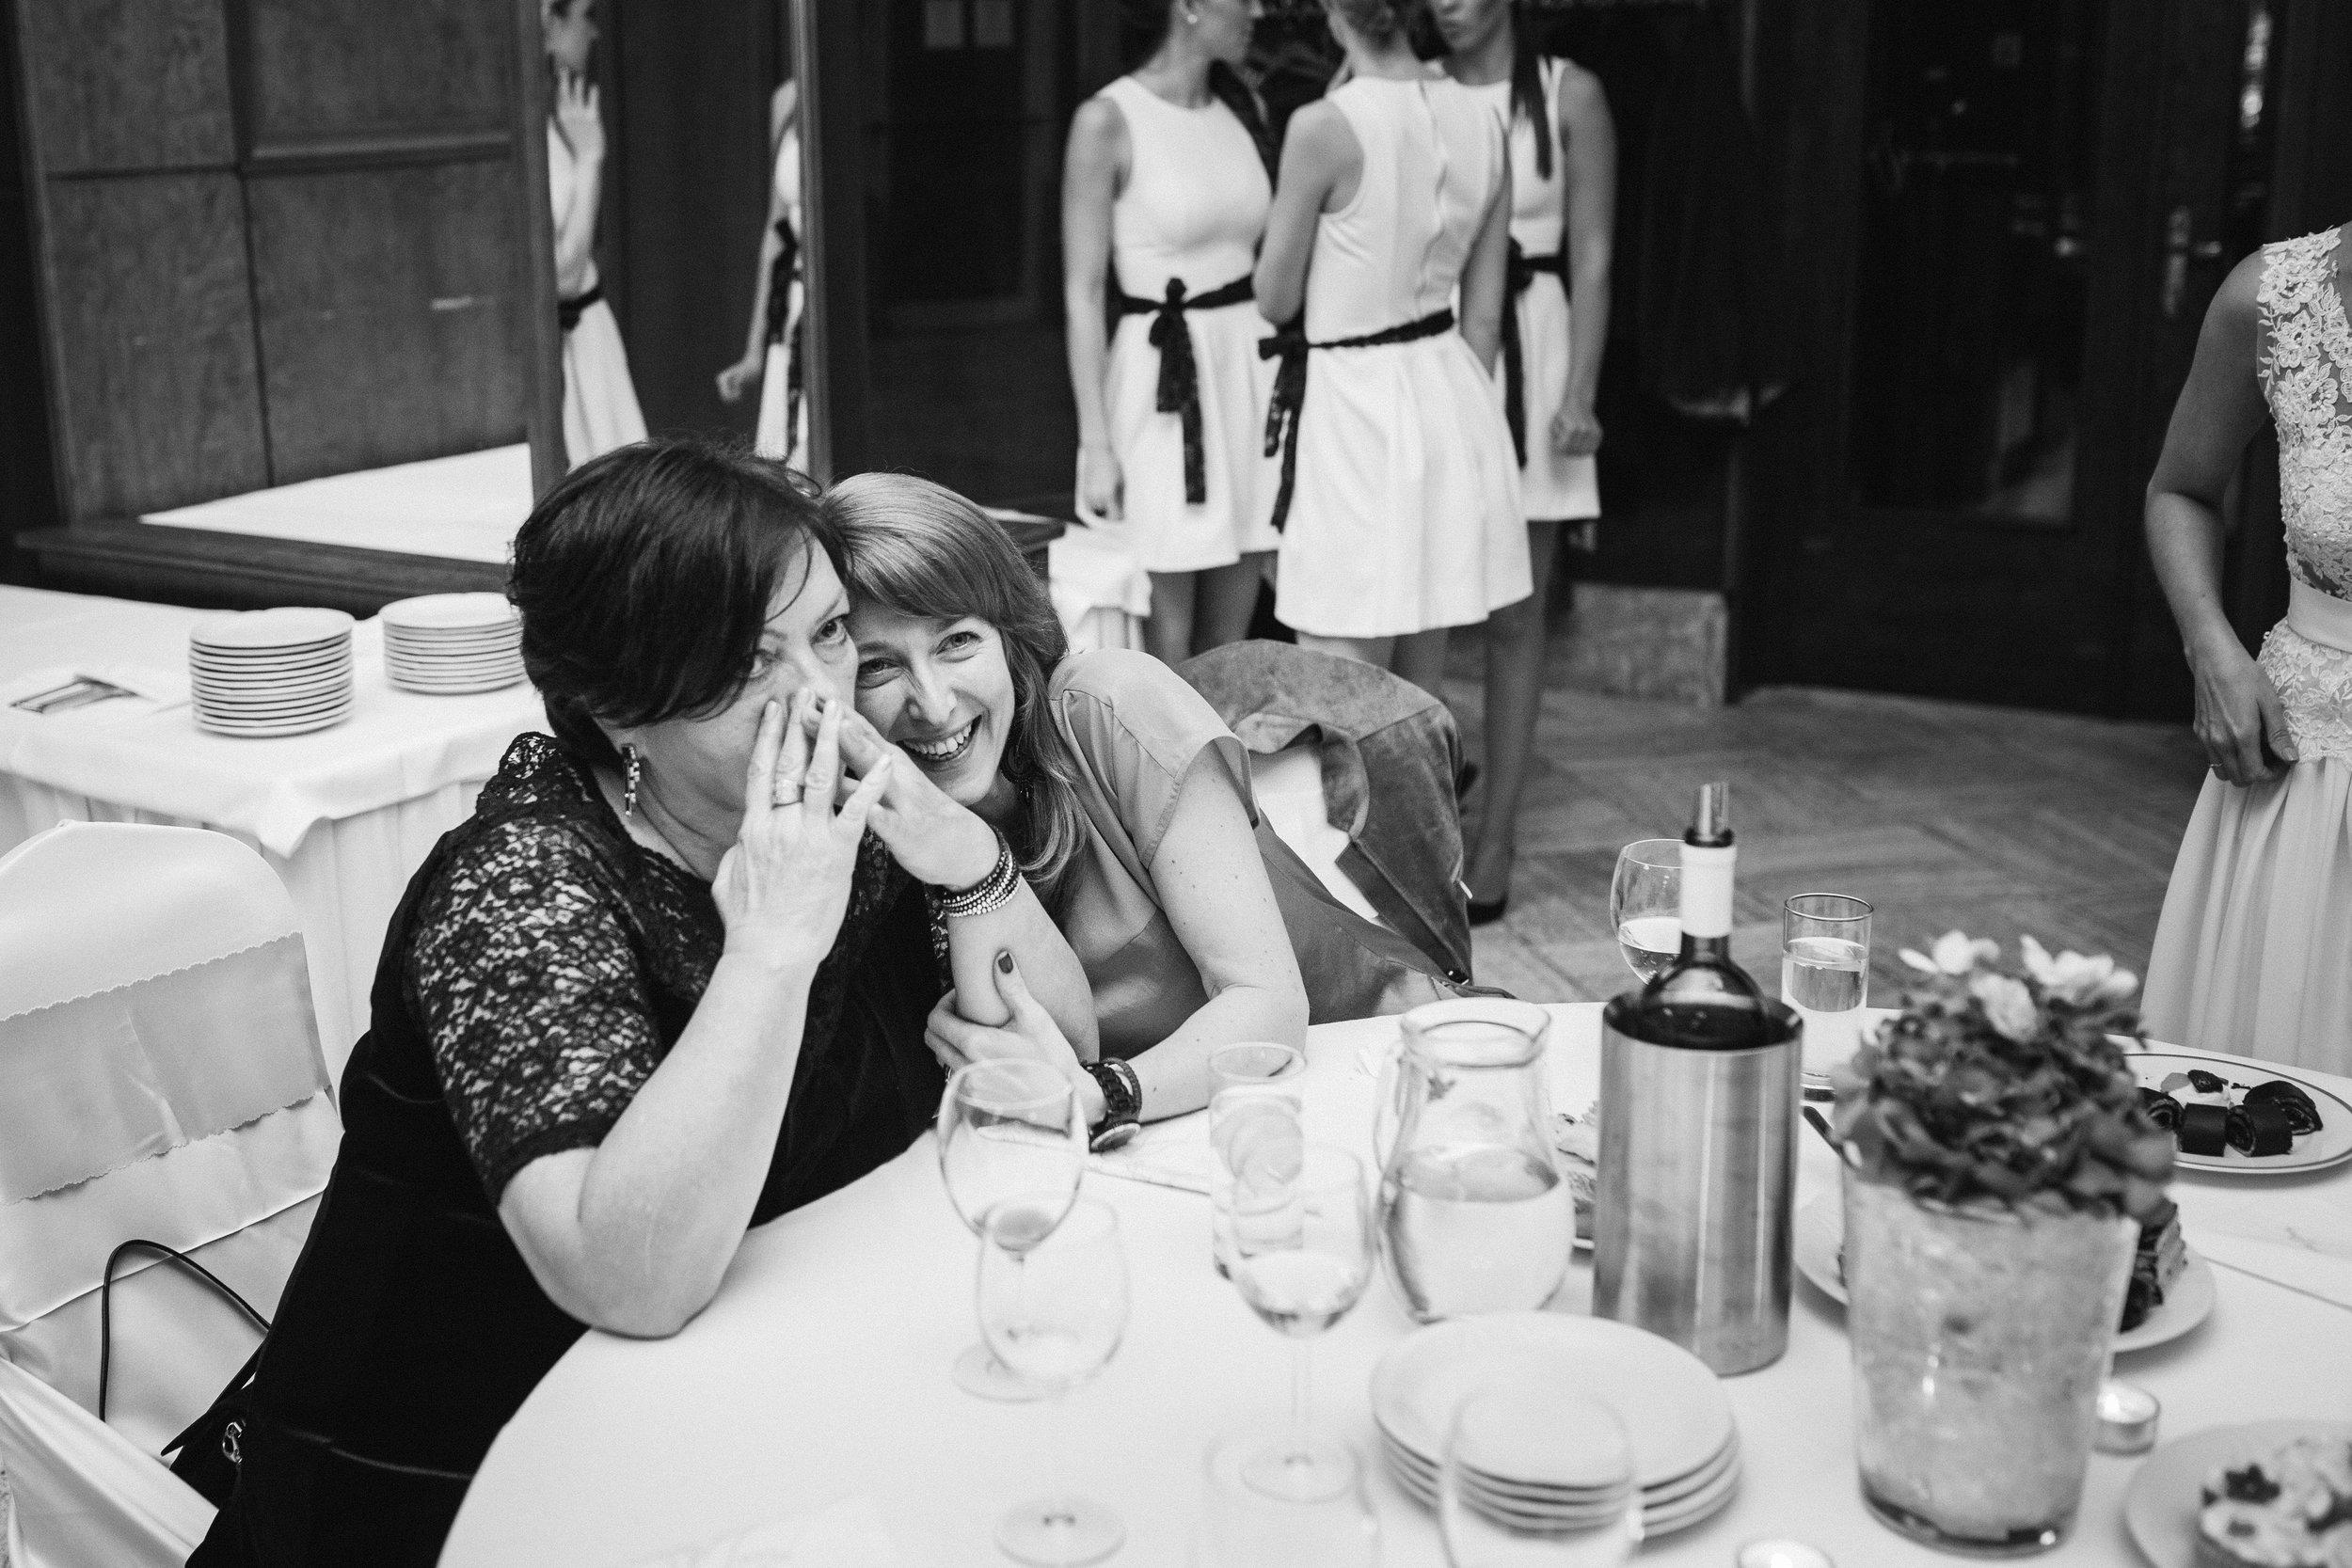 destination-wedding-photographer-slovakia-bratislava-bw-laughing-guests-documentary-style.jpg